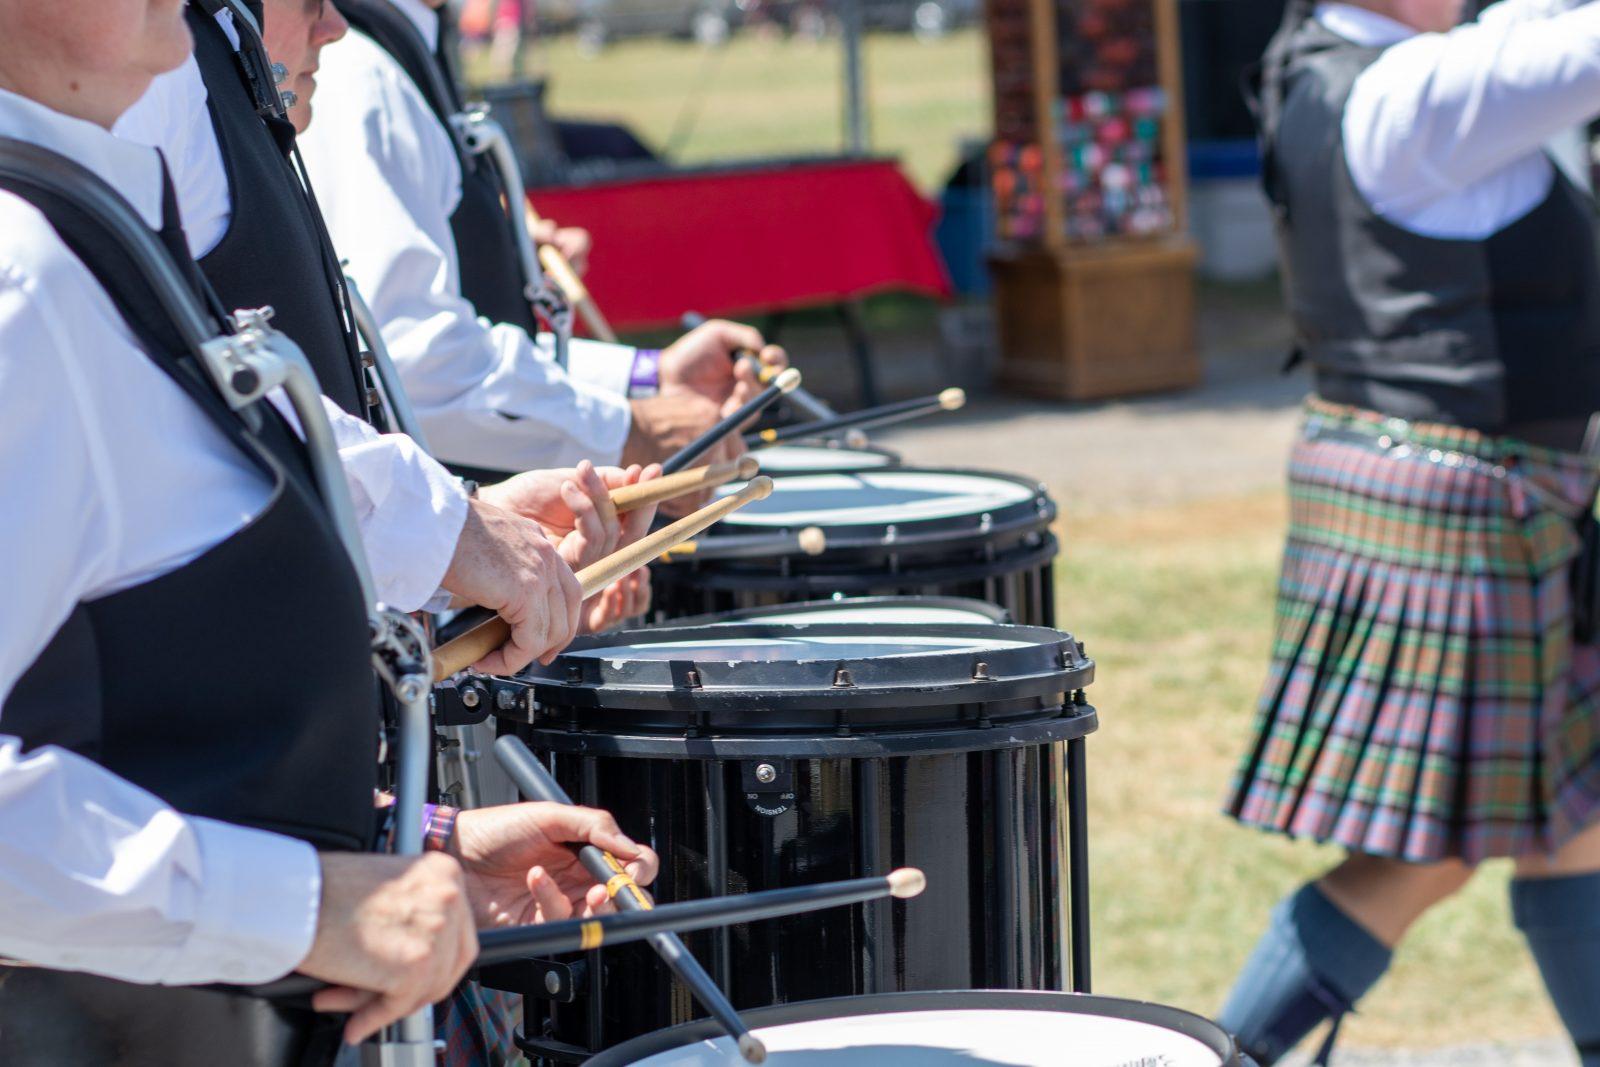 Glengarry Highland Games 2019 results make history